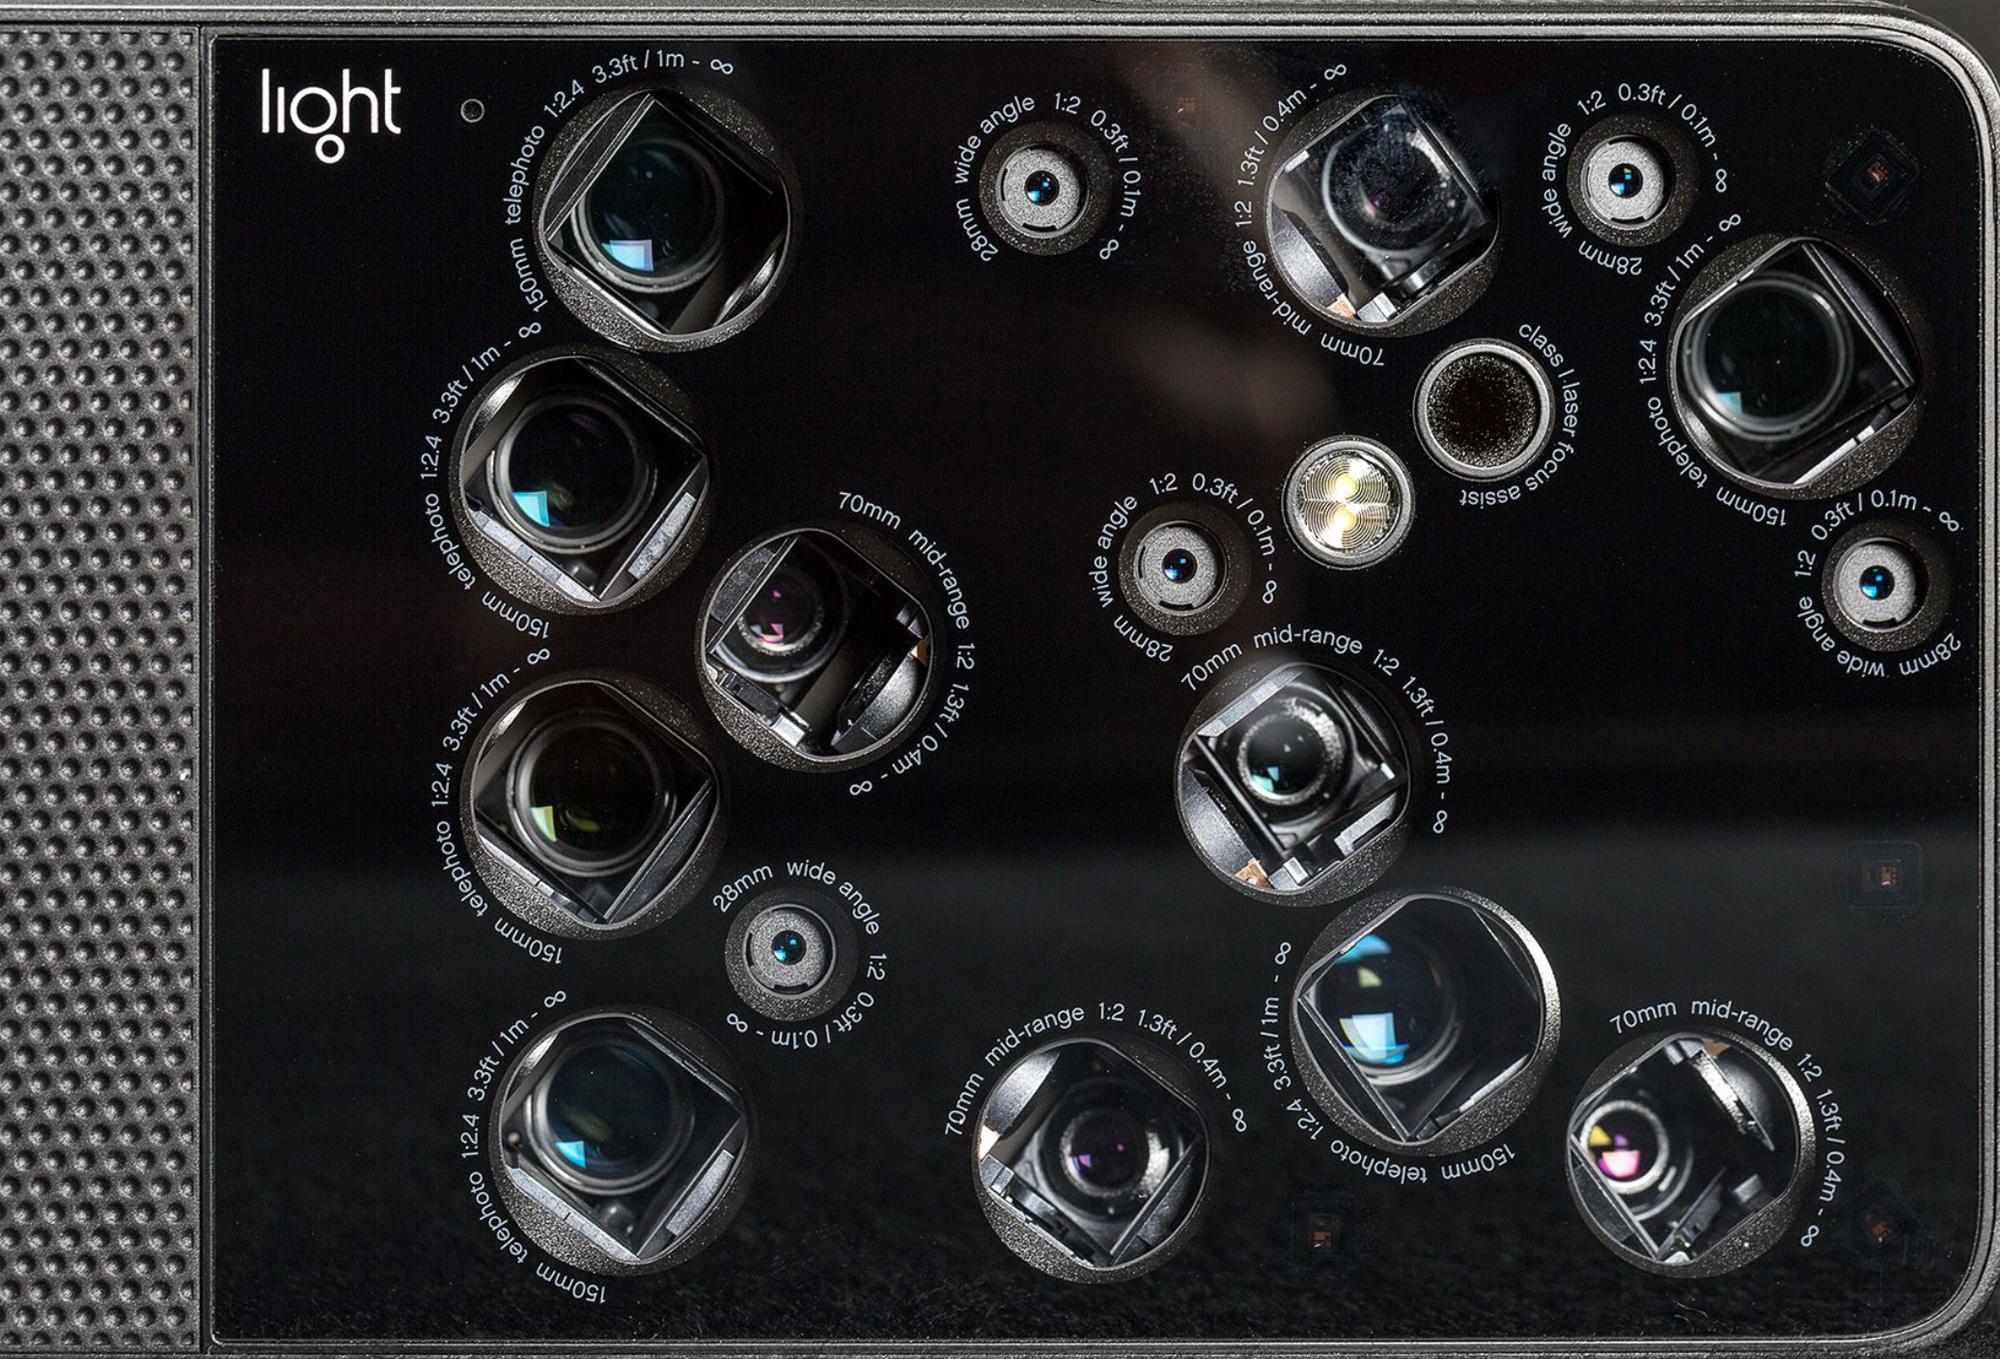 The 12 lenses fo the Light 16